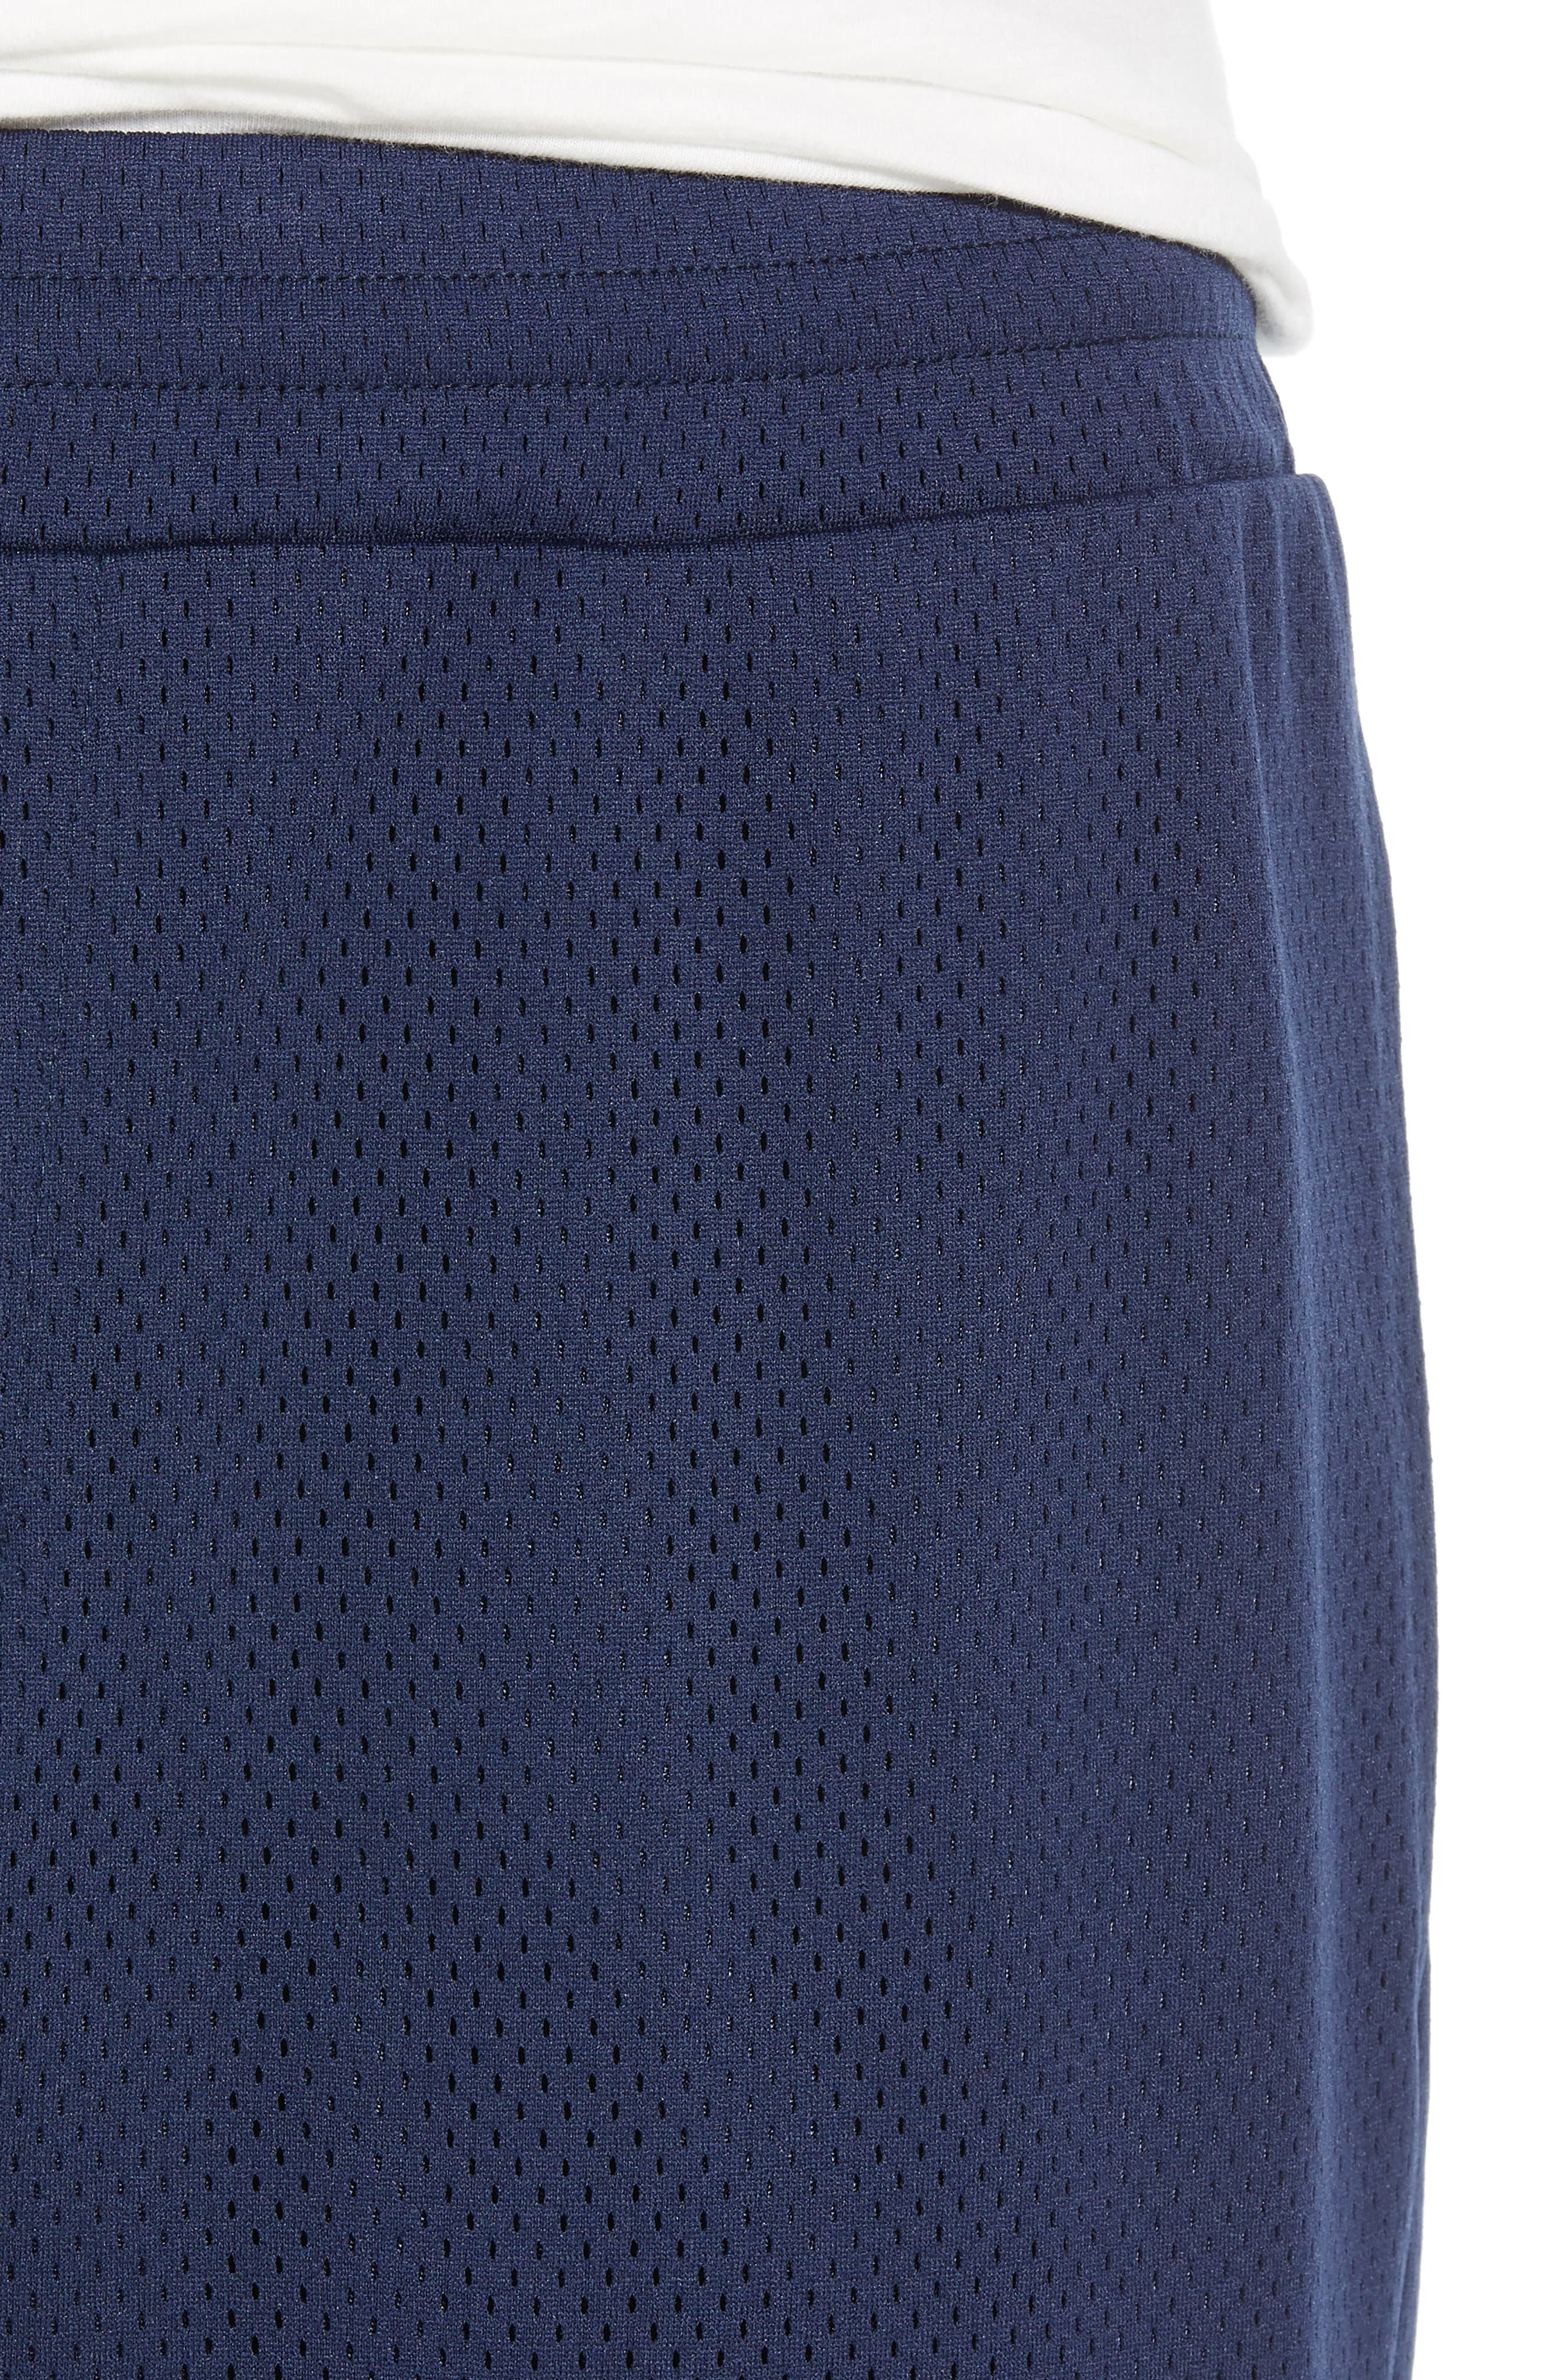 Basketball Shorts,                             Alternate thumbnail 4, color,                             NAVY PEACOAT